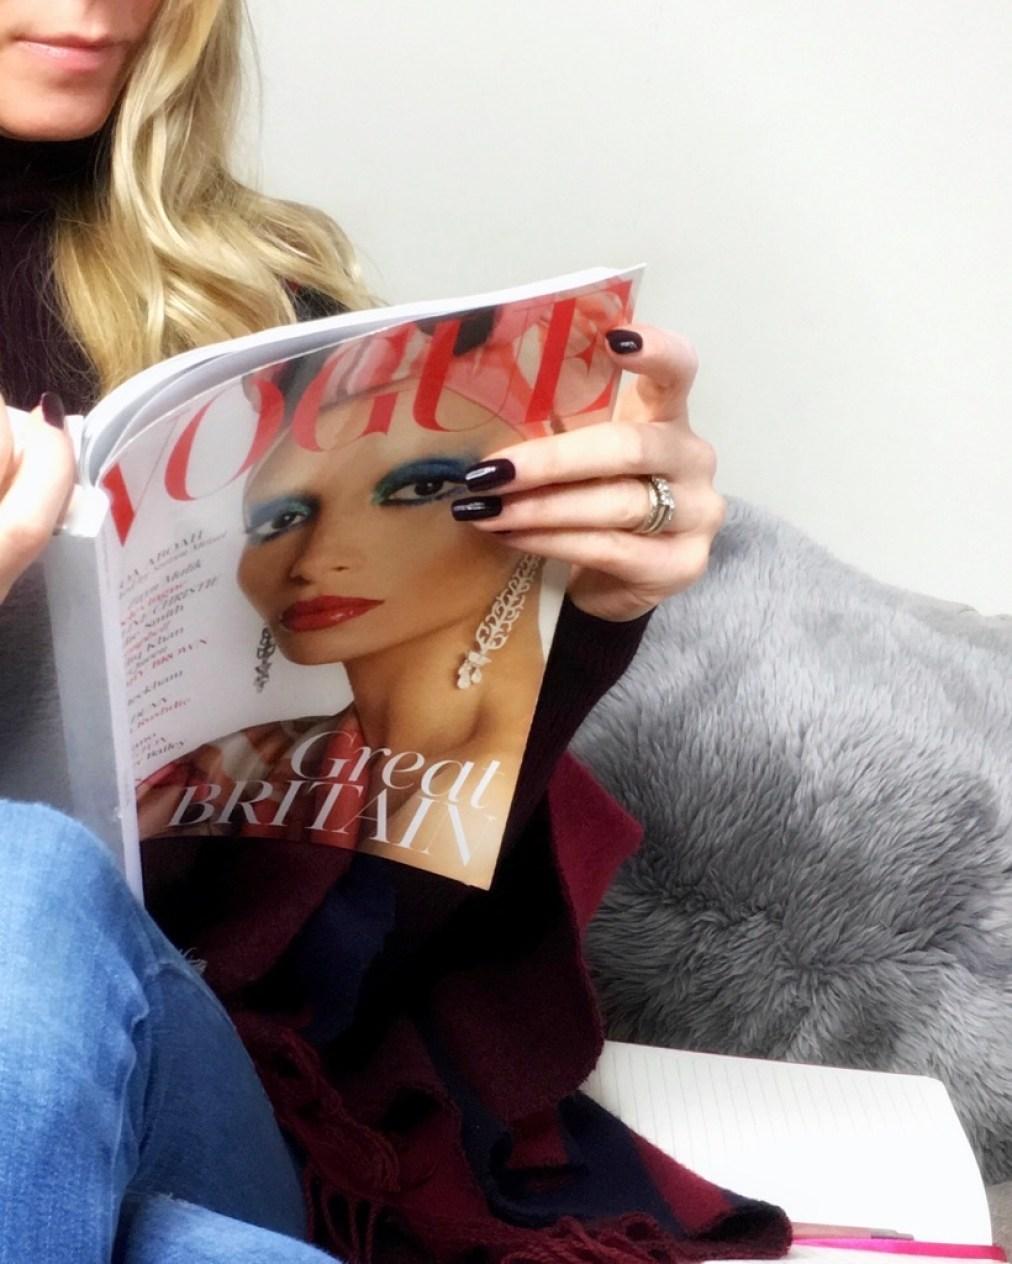 Samantha reading Vogue magazine